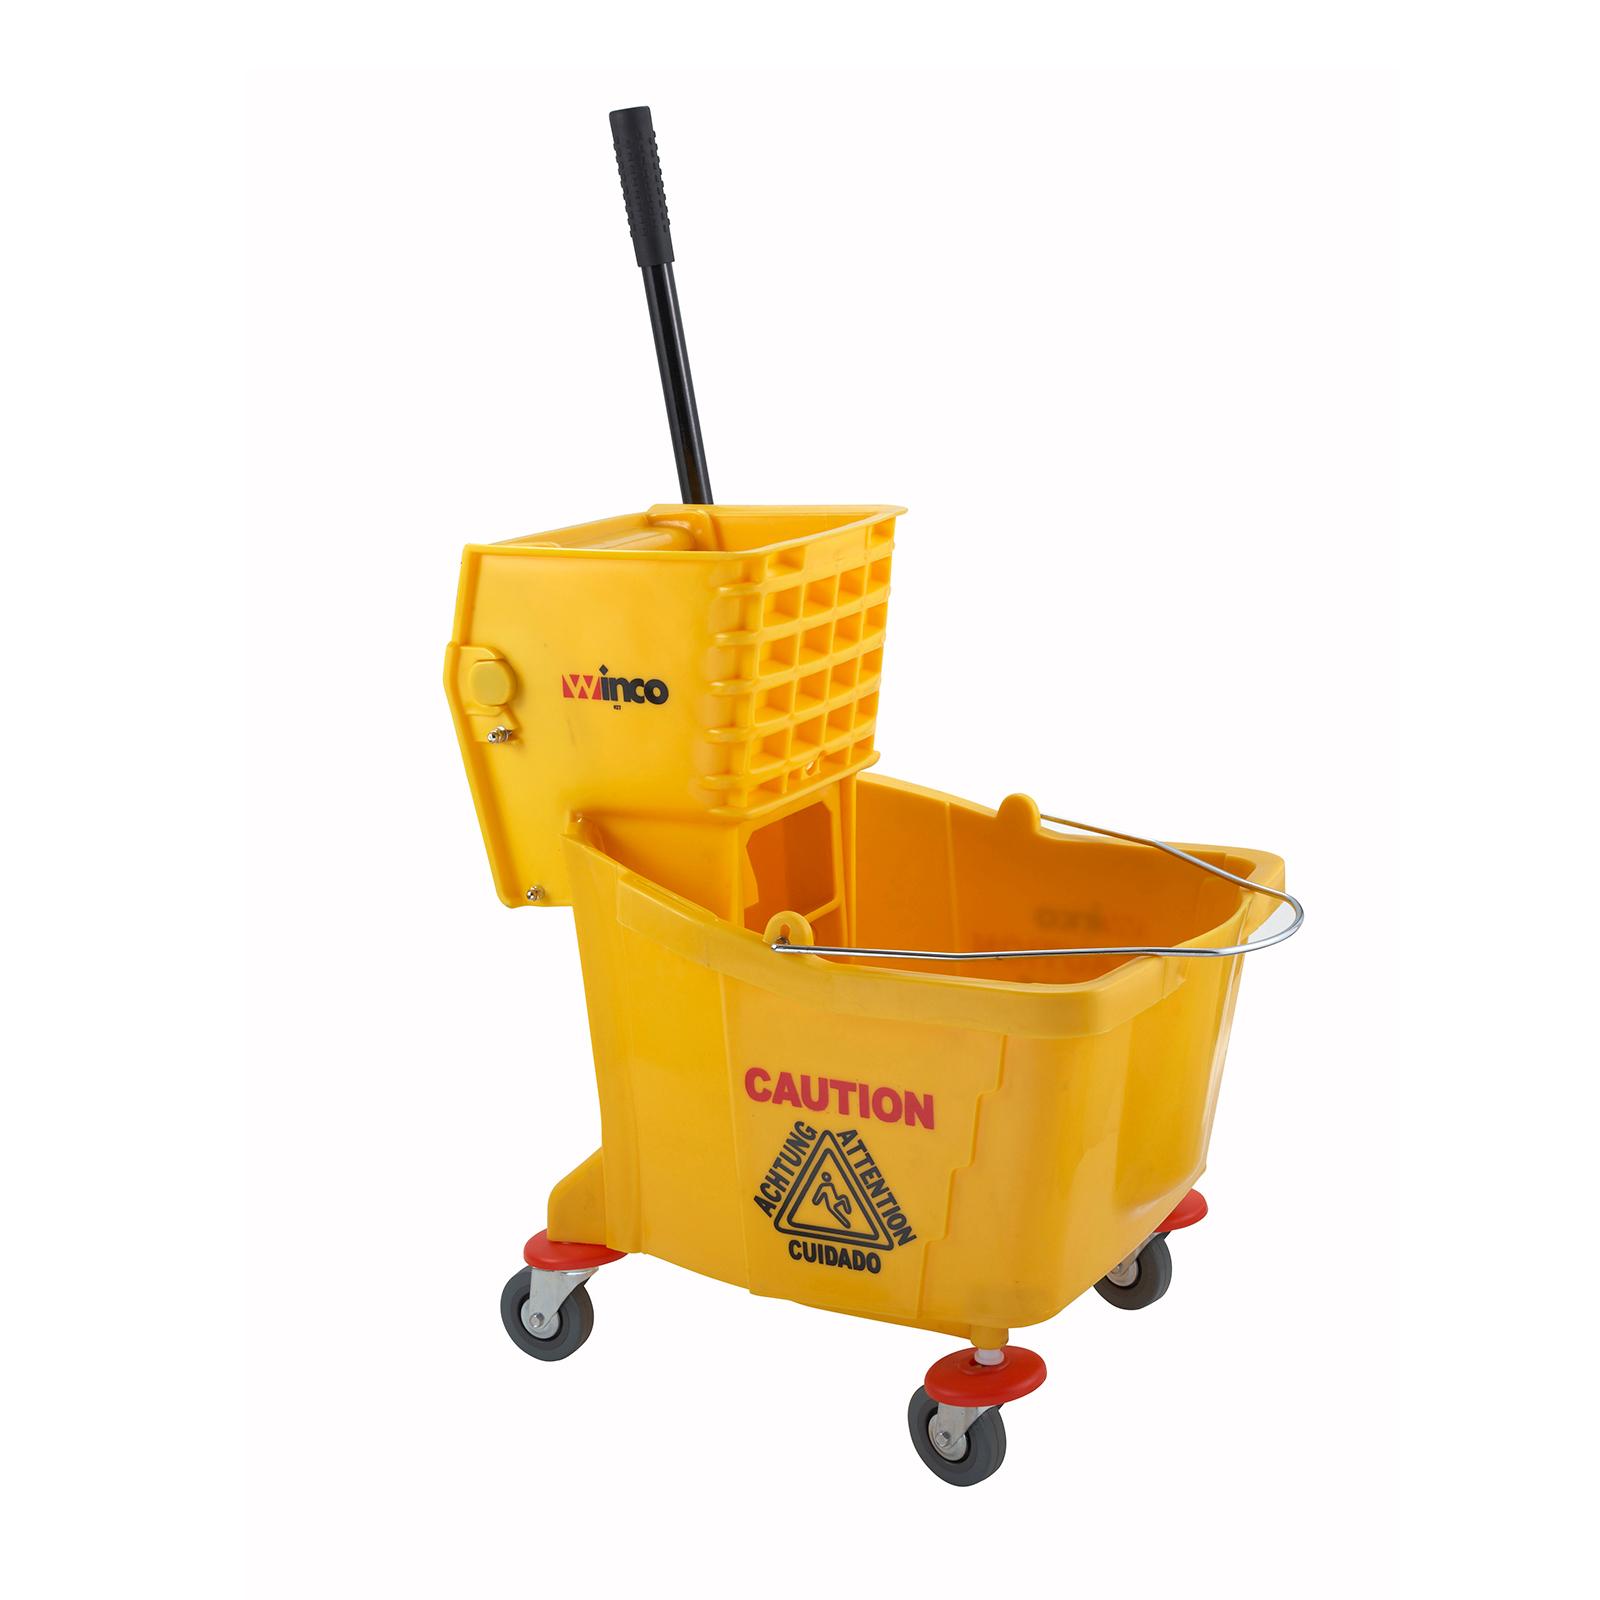 3700-17 Winco MPB-36 mop bucket wringer combination